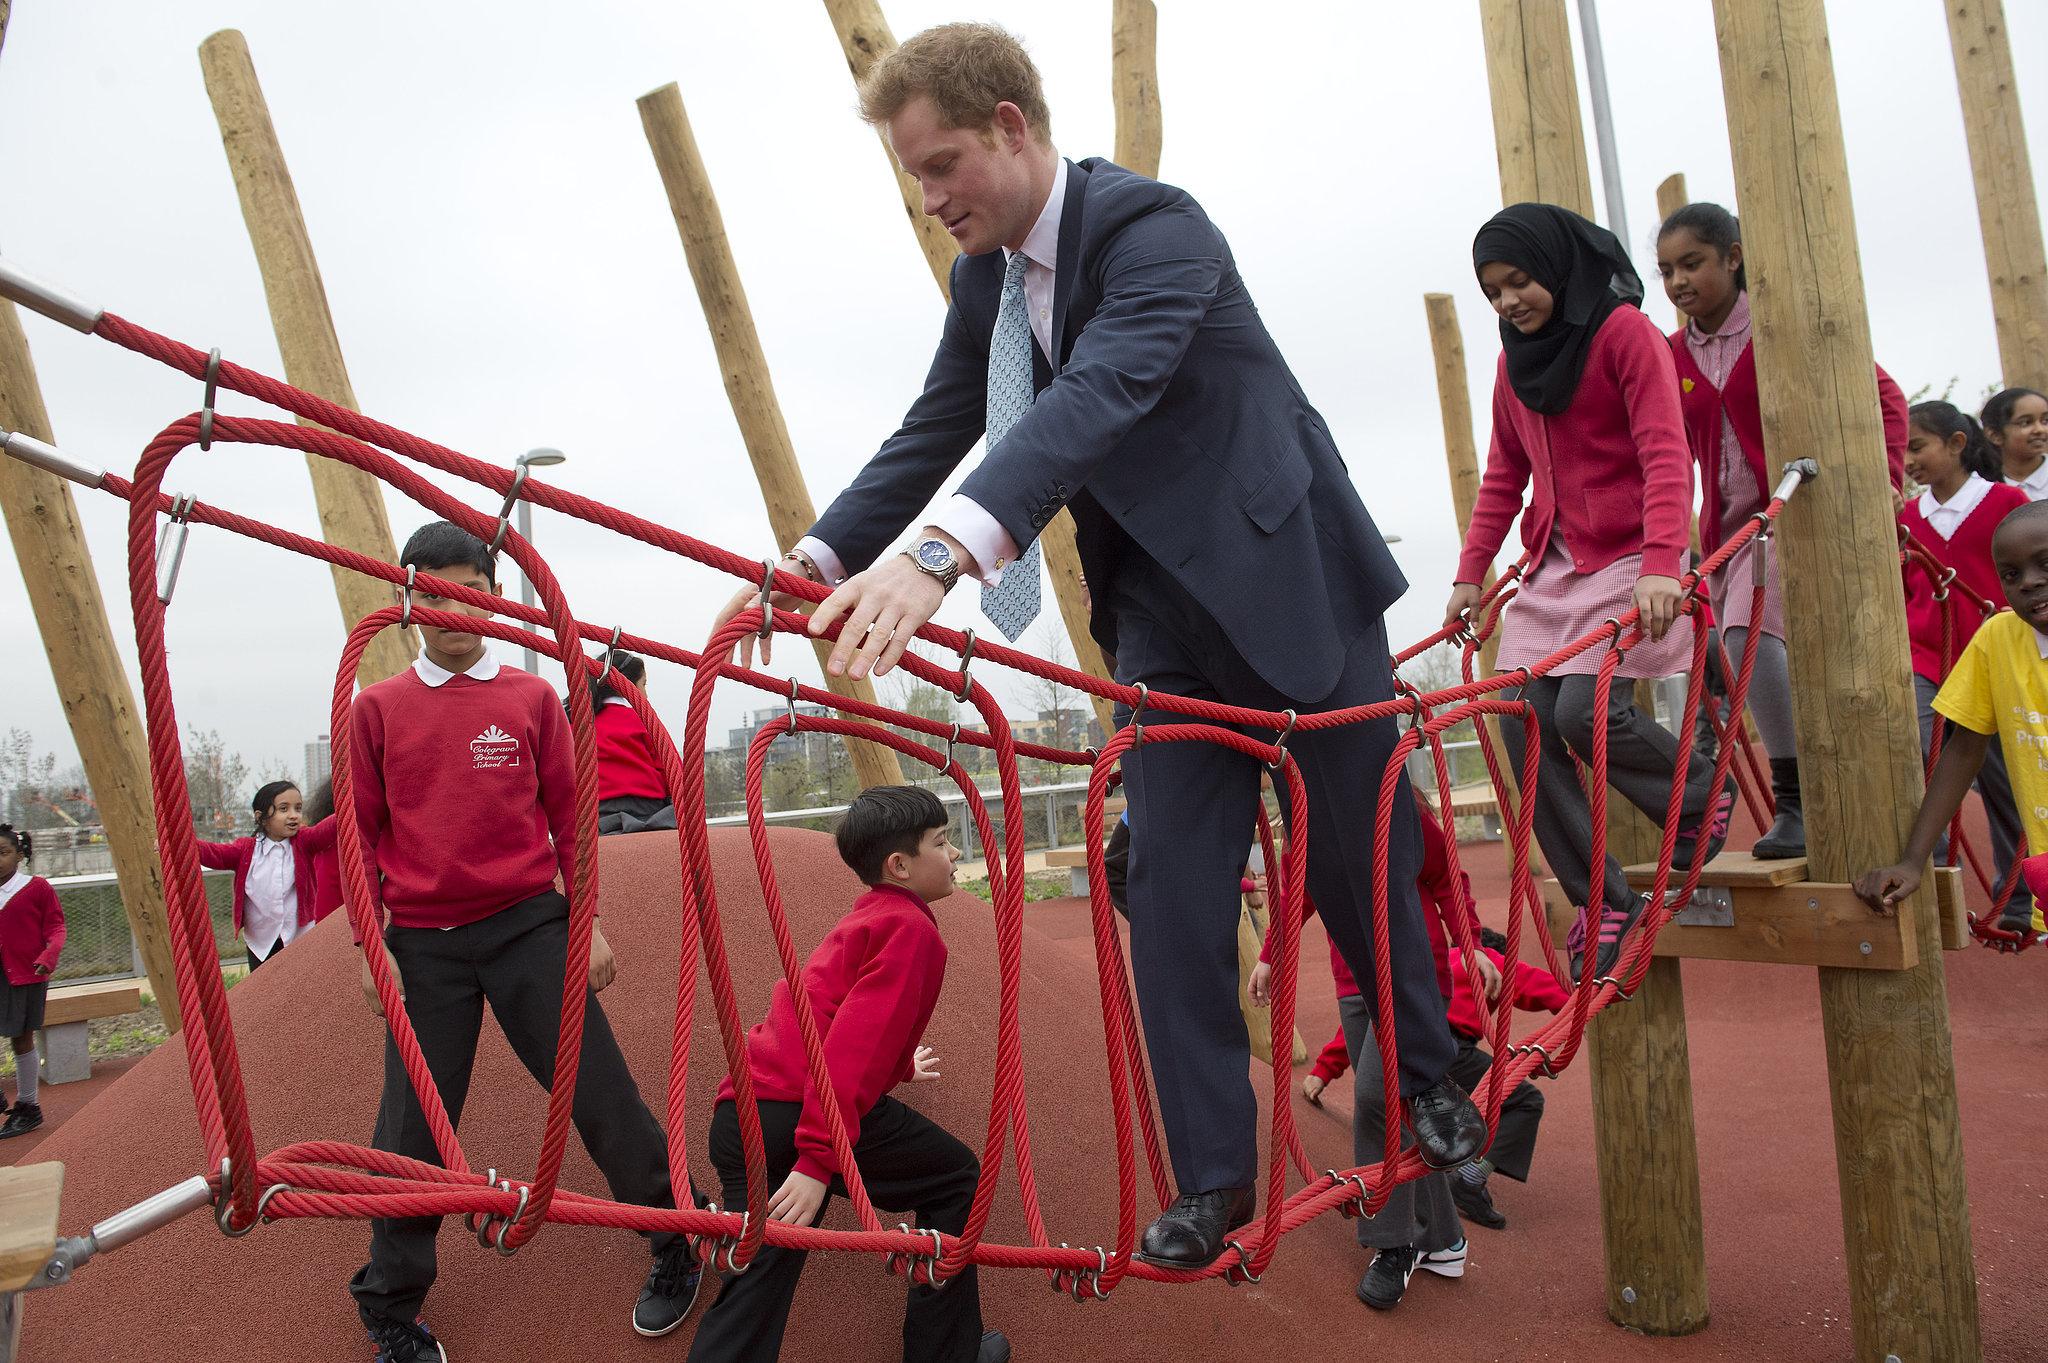 Prince Harry's Playground Antics Are Hilarious